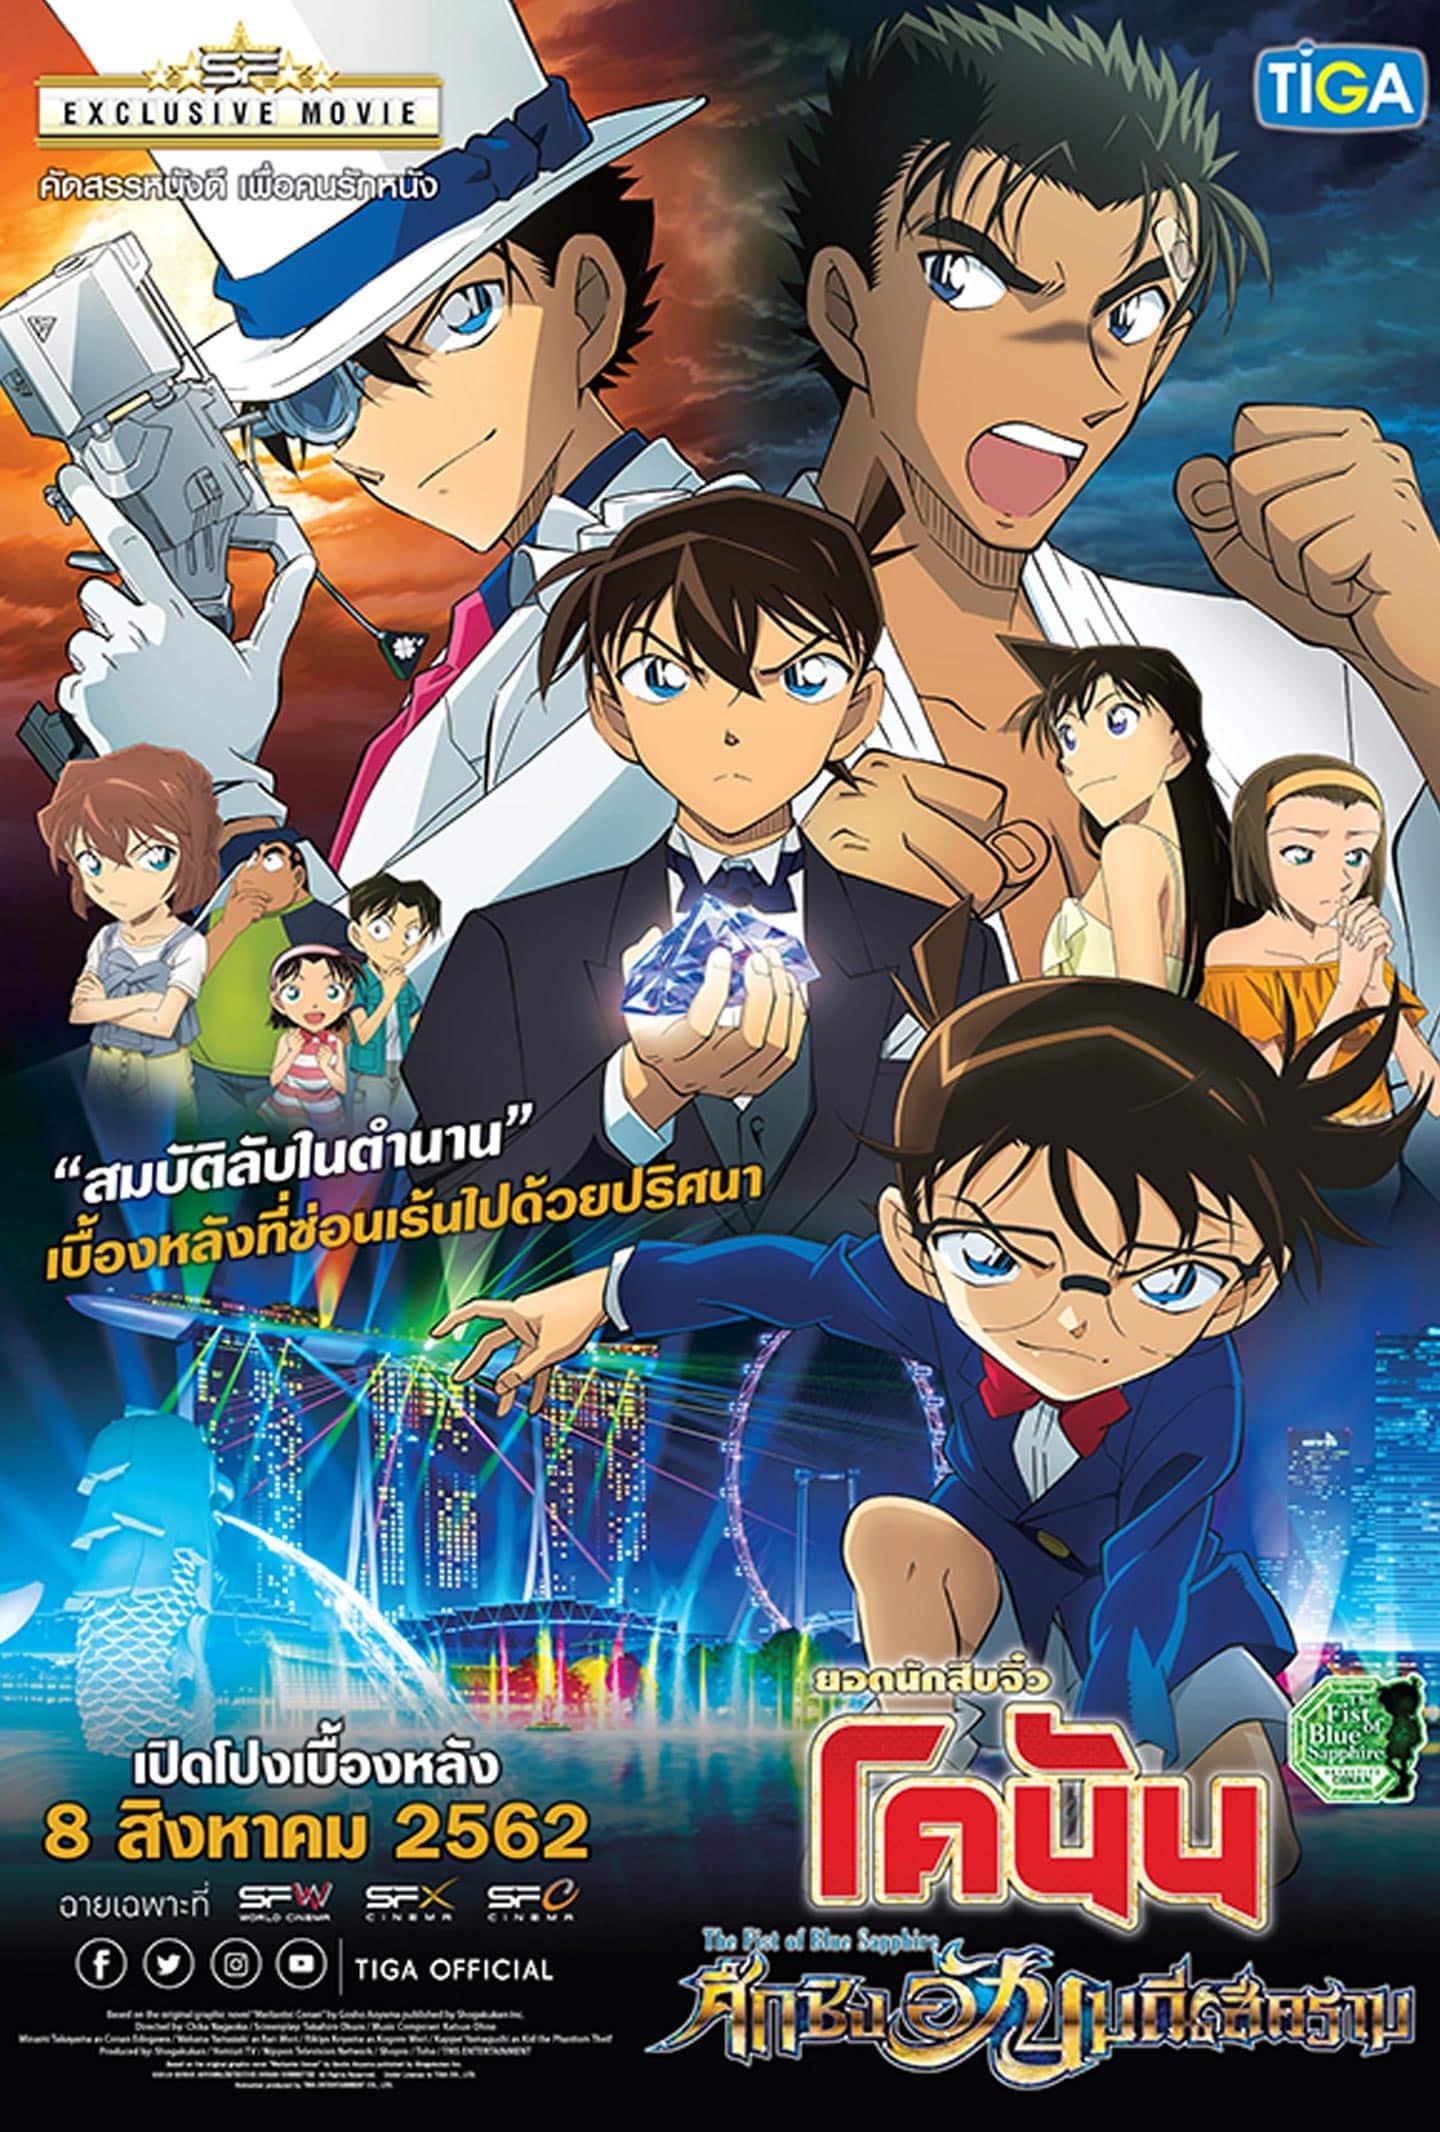 Conan Movie 23 : The Fist of Blue Sapphire ศึกชิงอัญมณีสีคราม